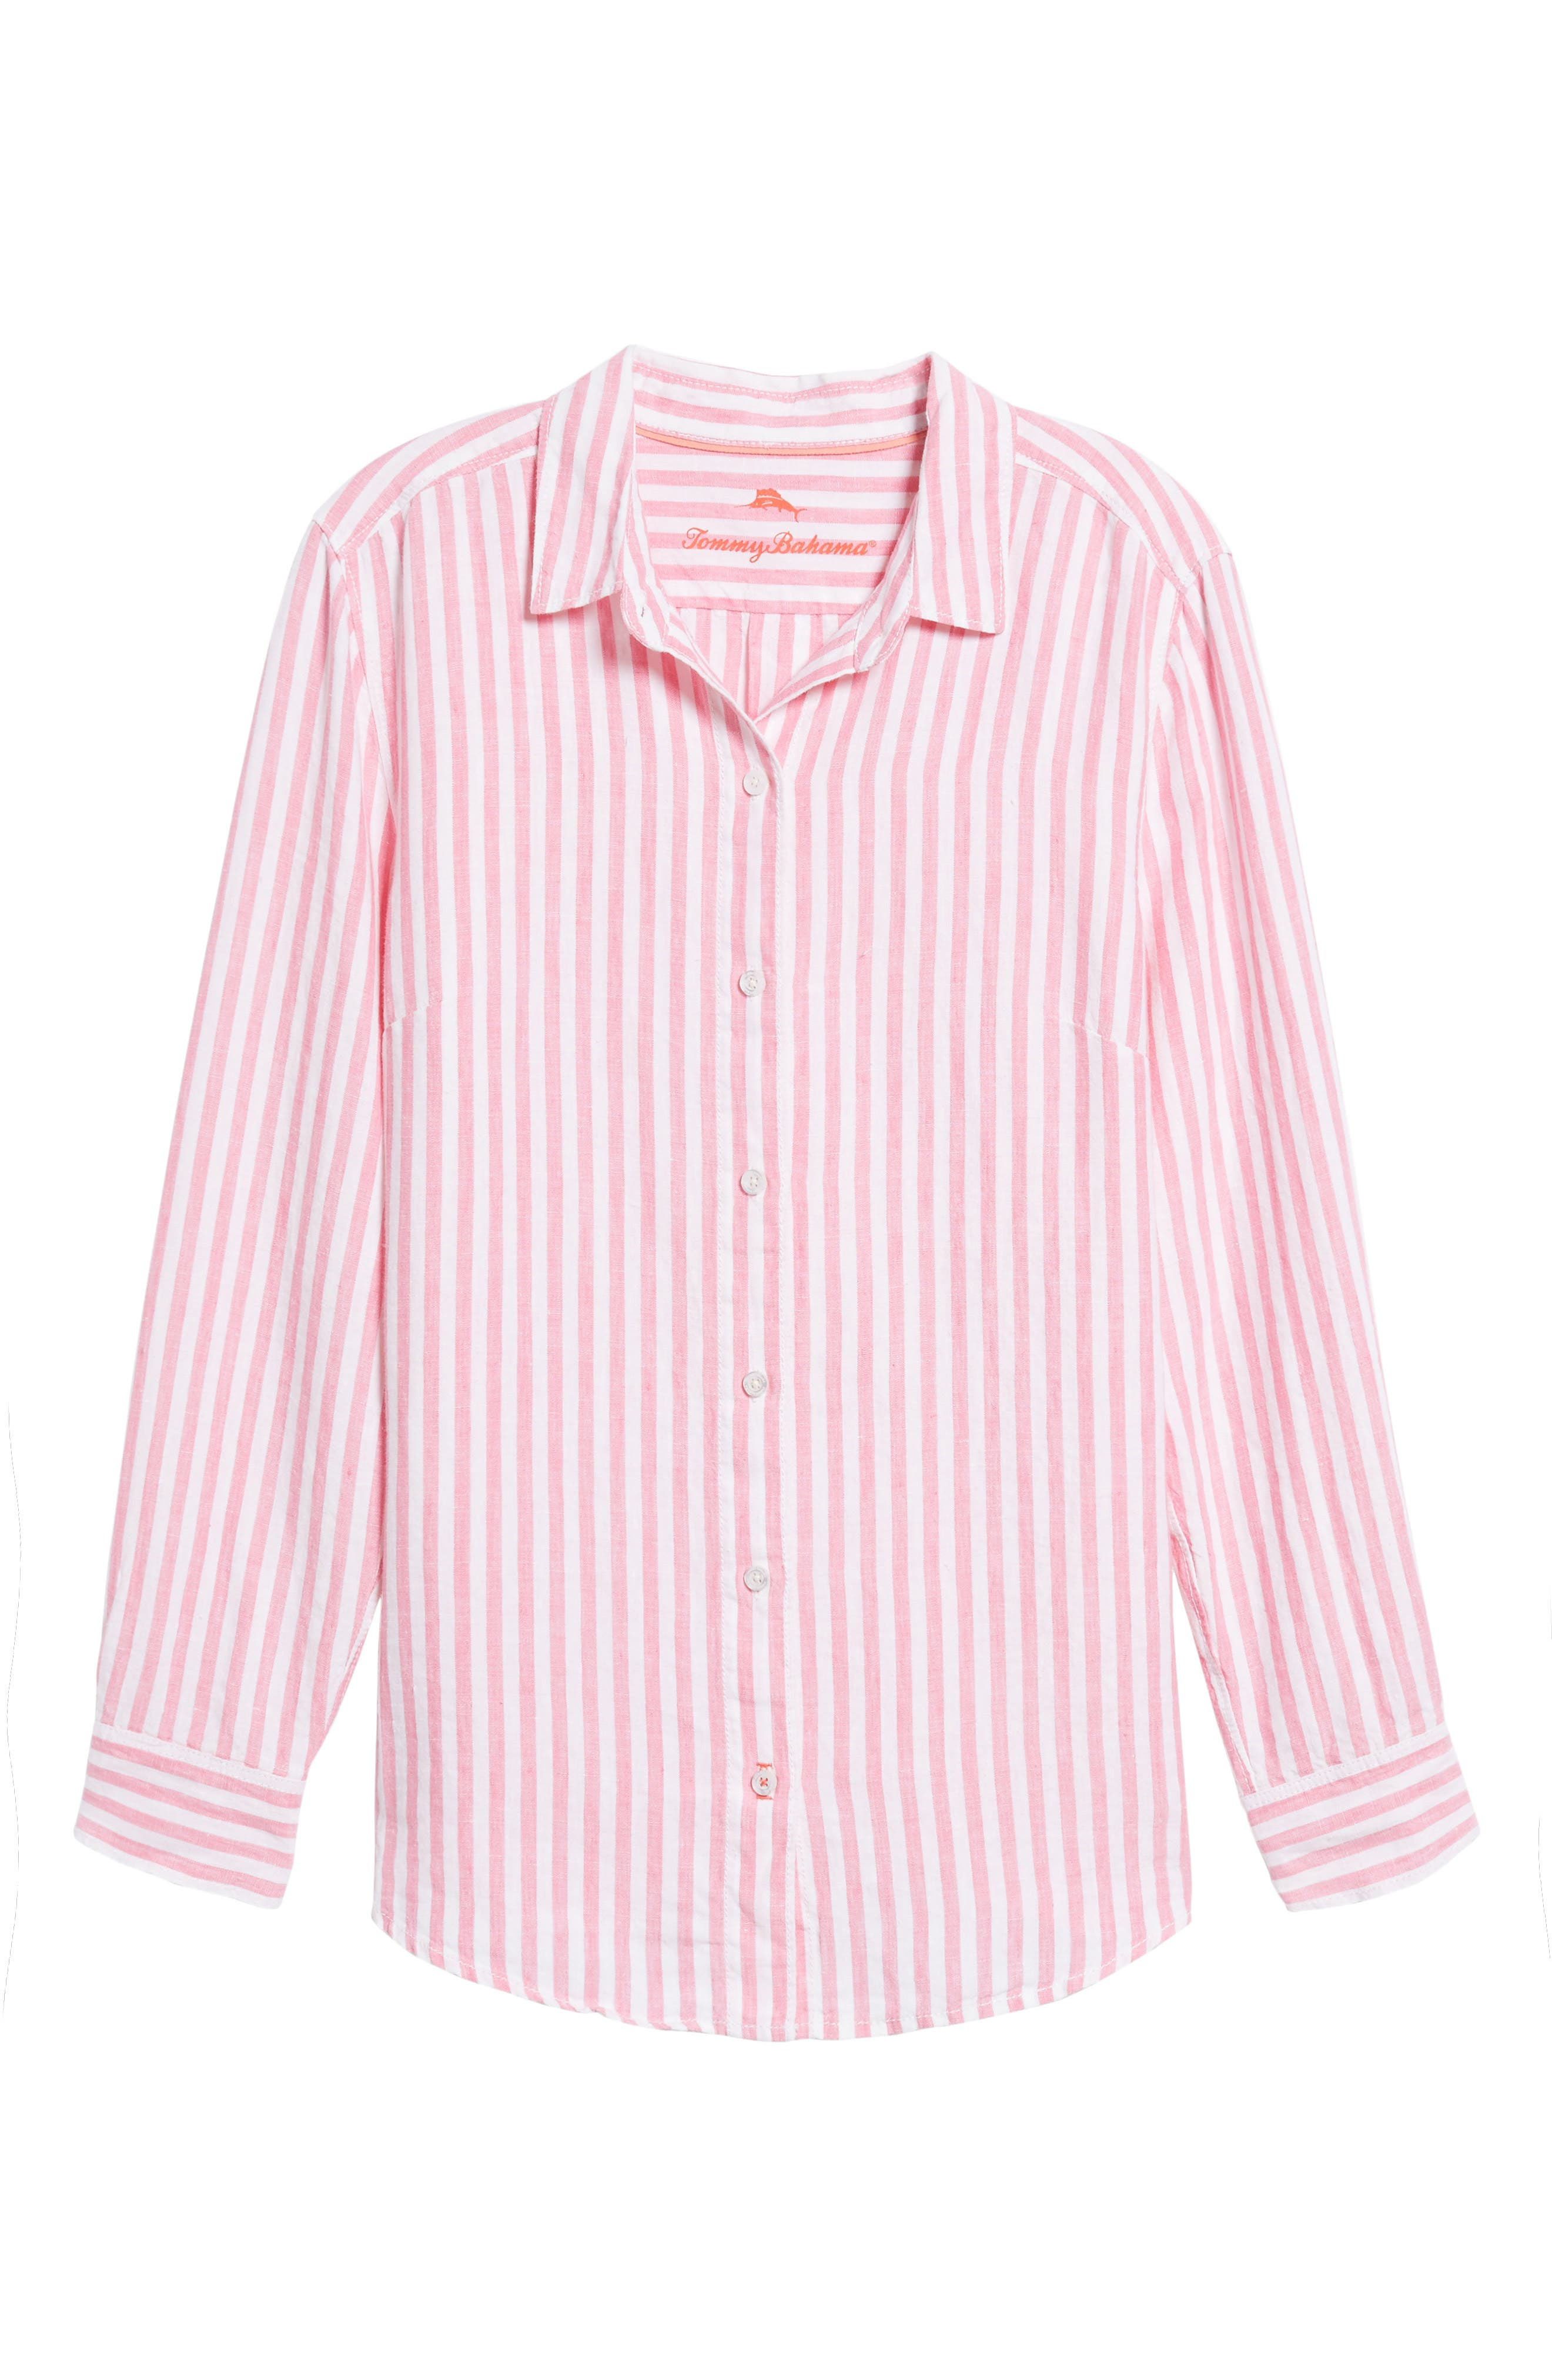 Cabana Stripe Button-Up Top,                             Main thumbnail 1, color,                             Soft Flamingo